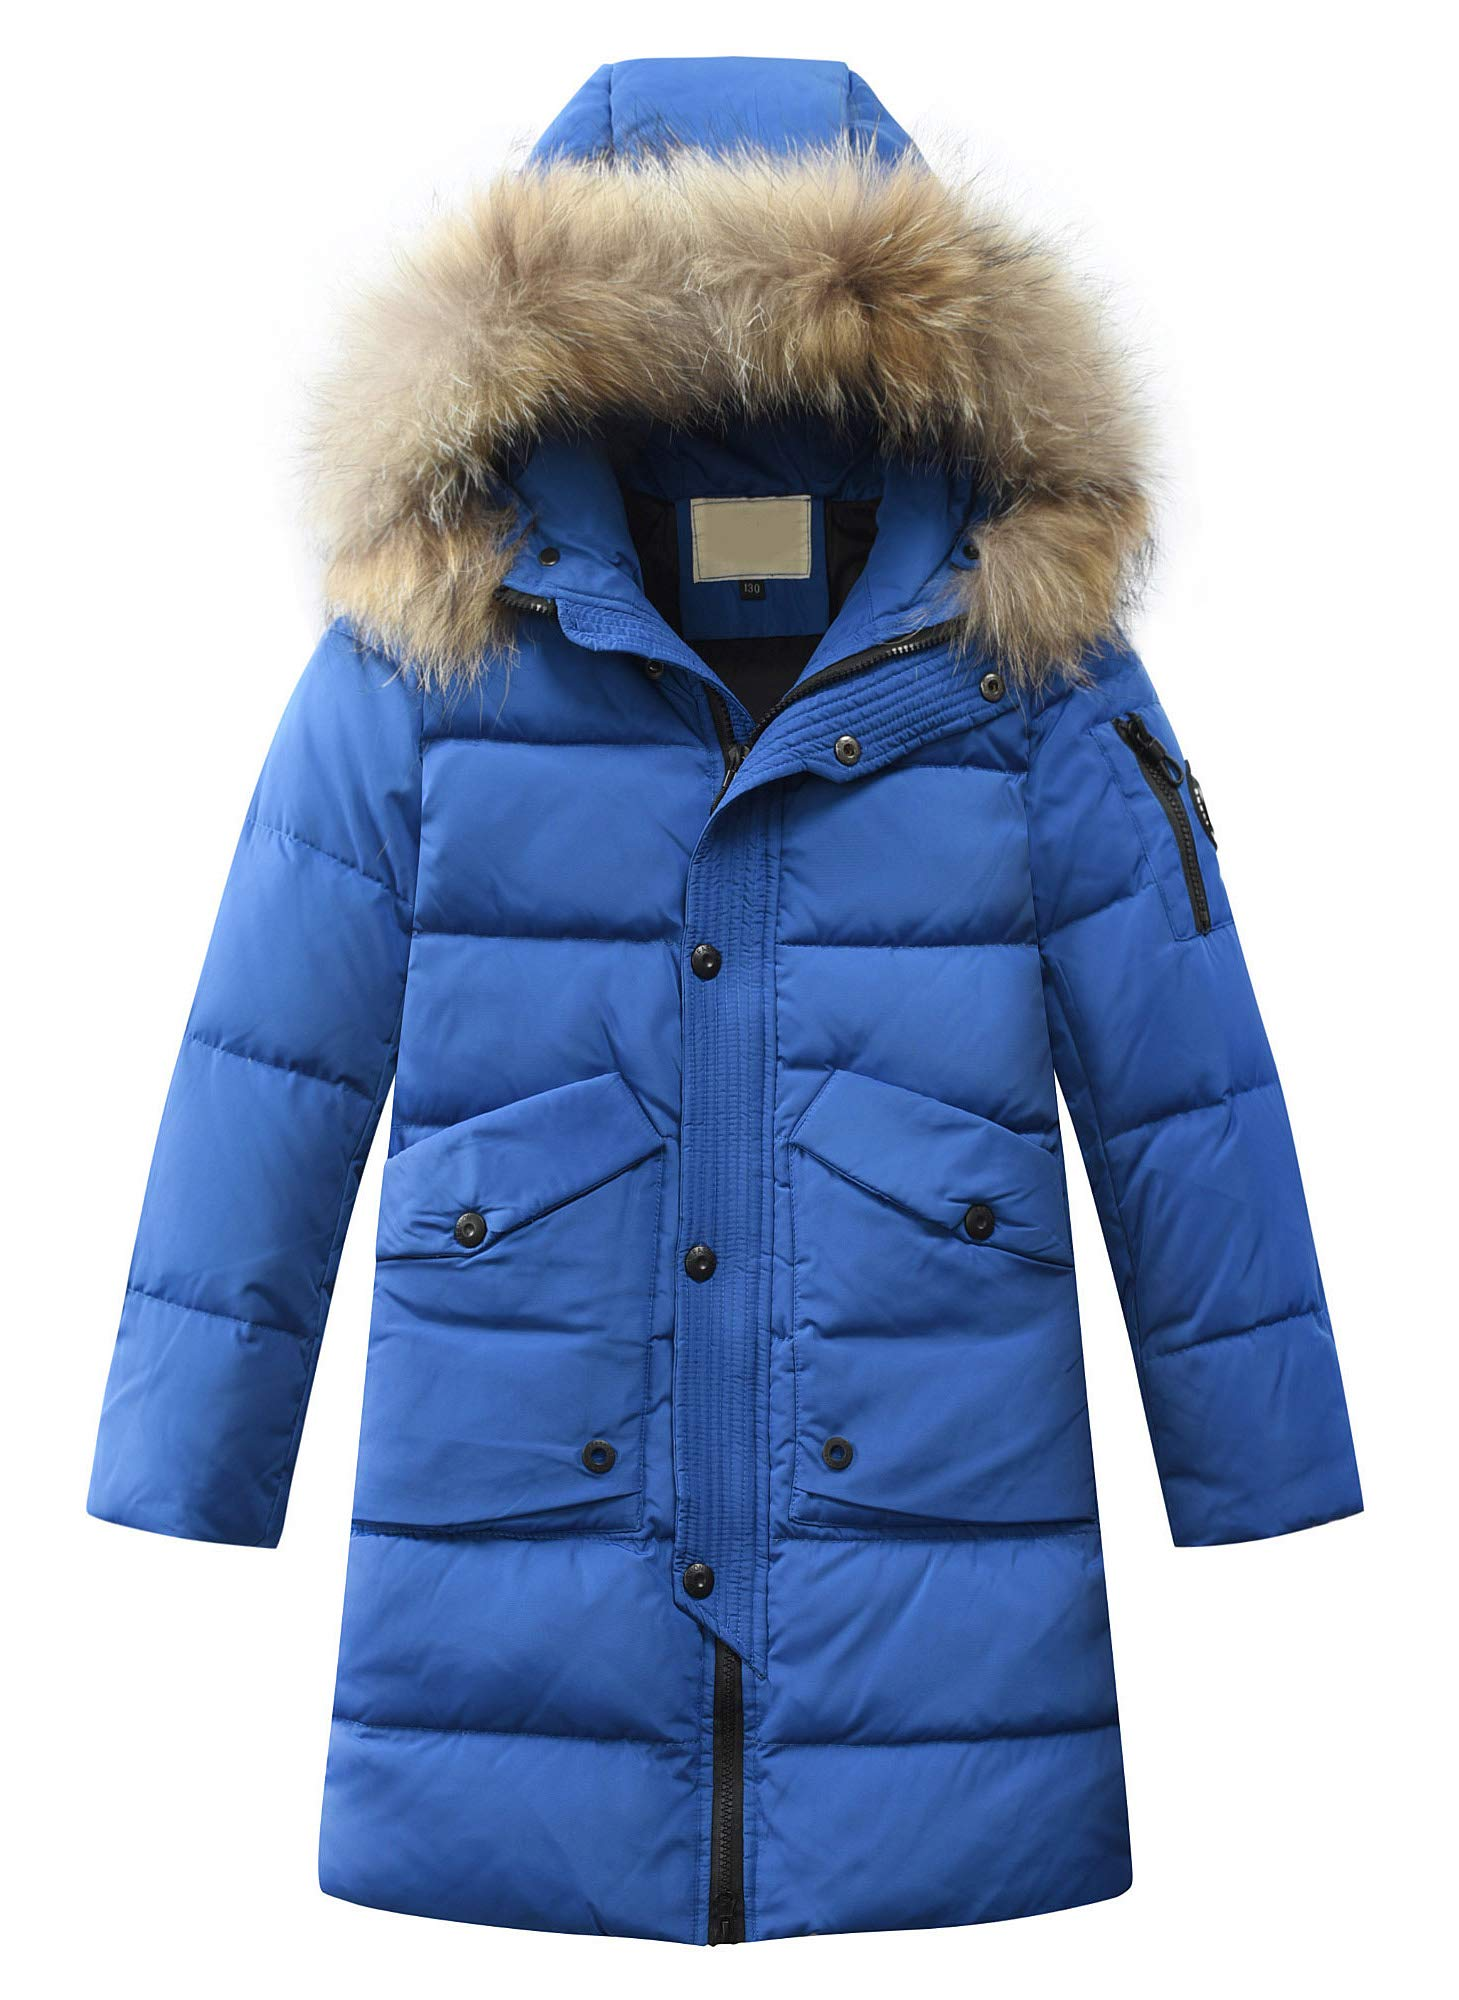 Mallimoda Boys Winter Cotton Hooded Coat Puffer Jacket Outwear Big Boys Mid-Long